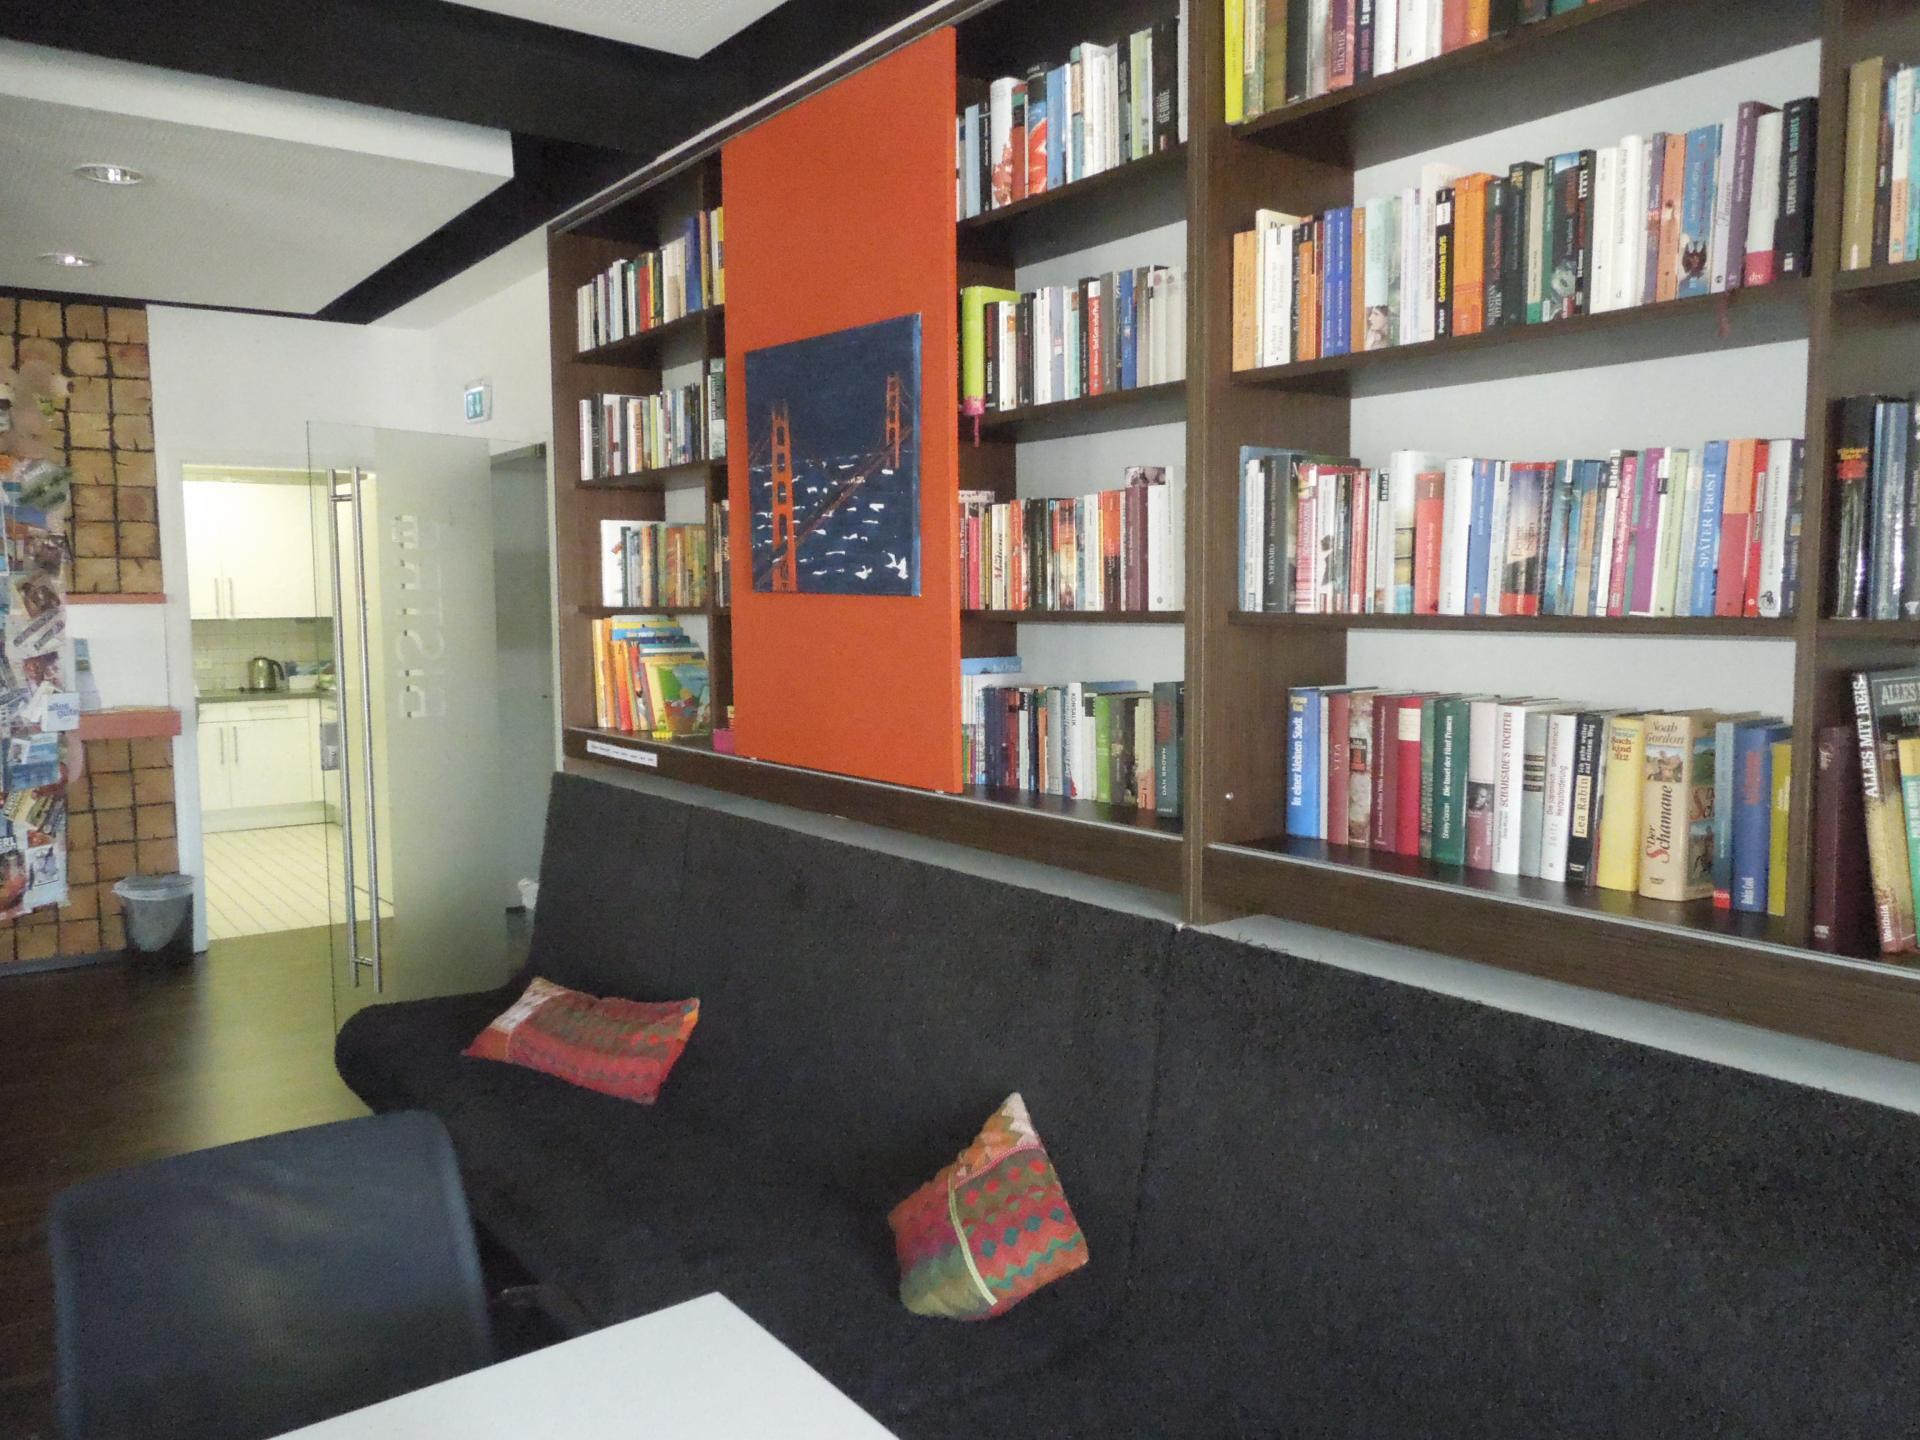 Bistro_Bibliothek